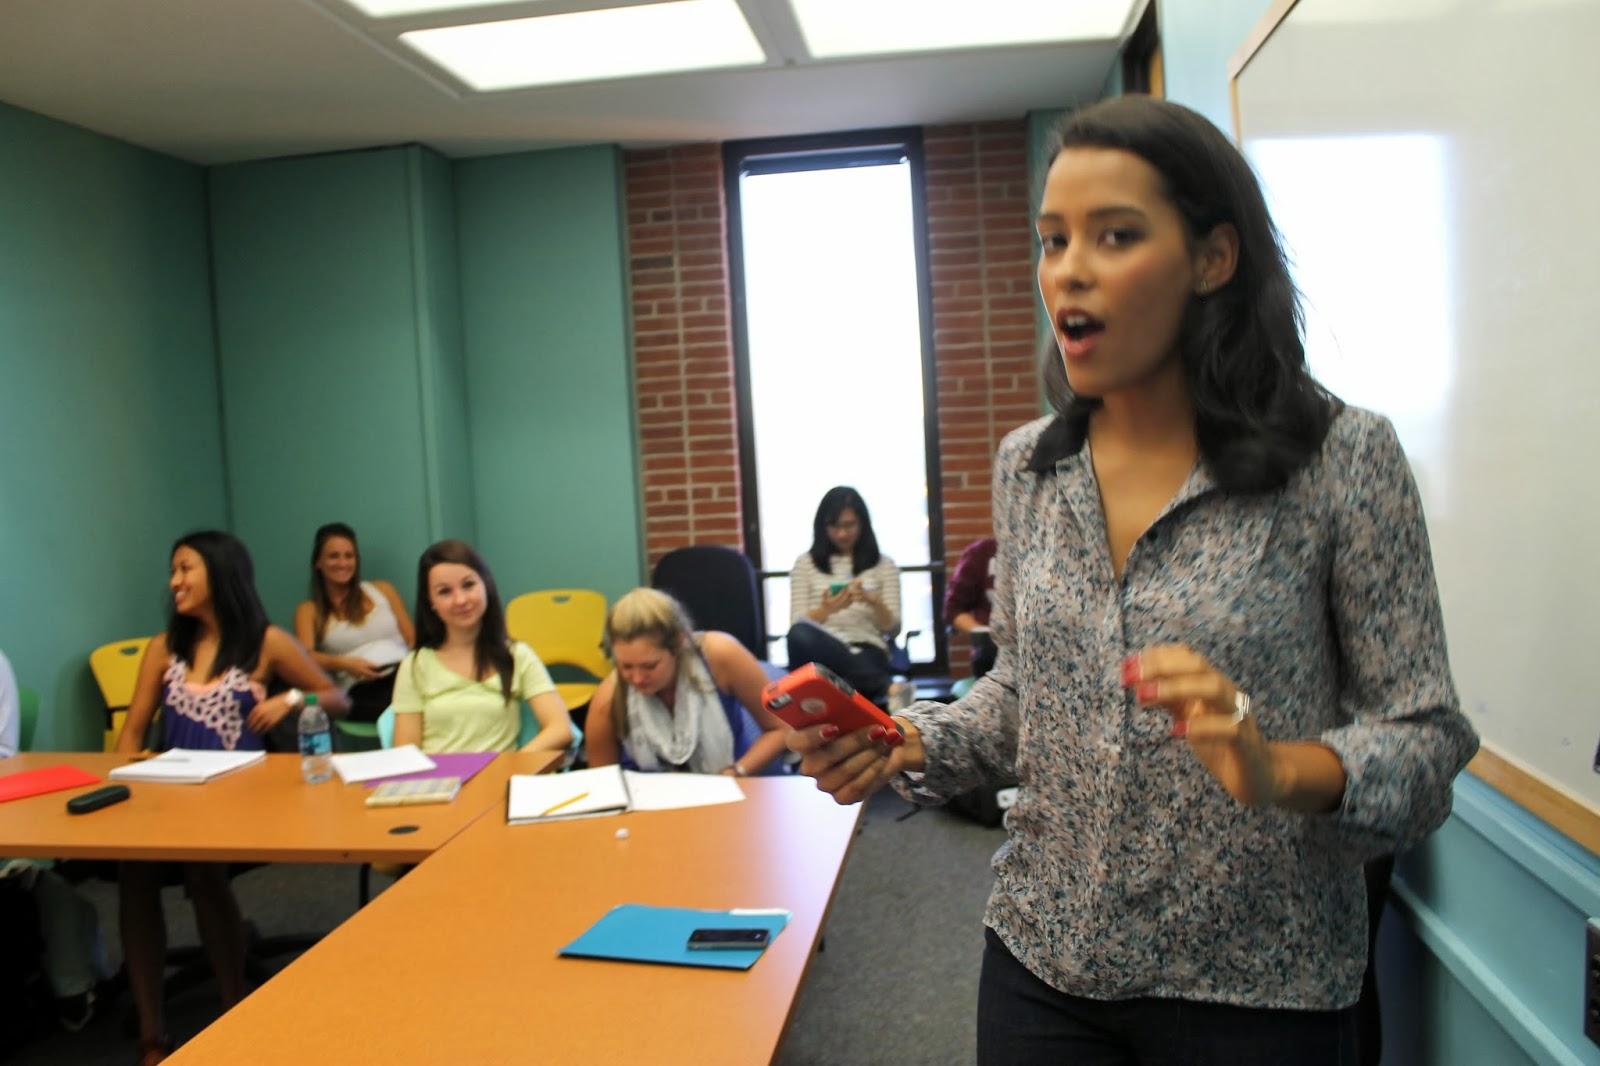 Journ 300 A Umass Journalism Newswriting And Reporting Blog Anaridis Rodriguez Visit